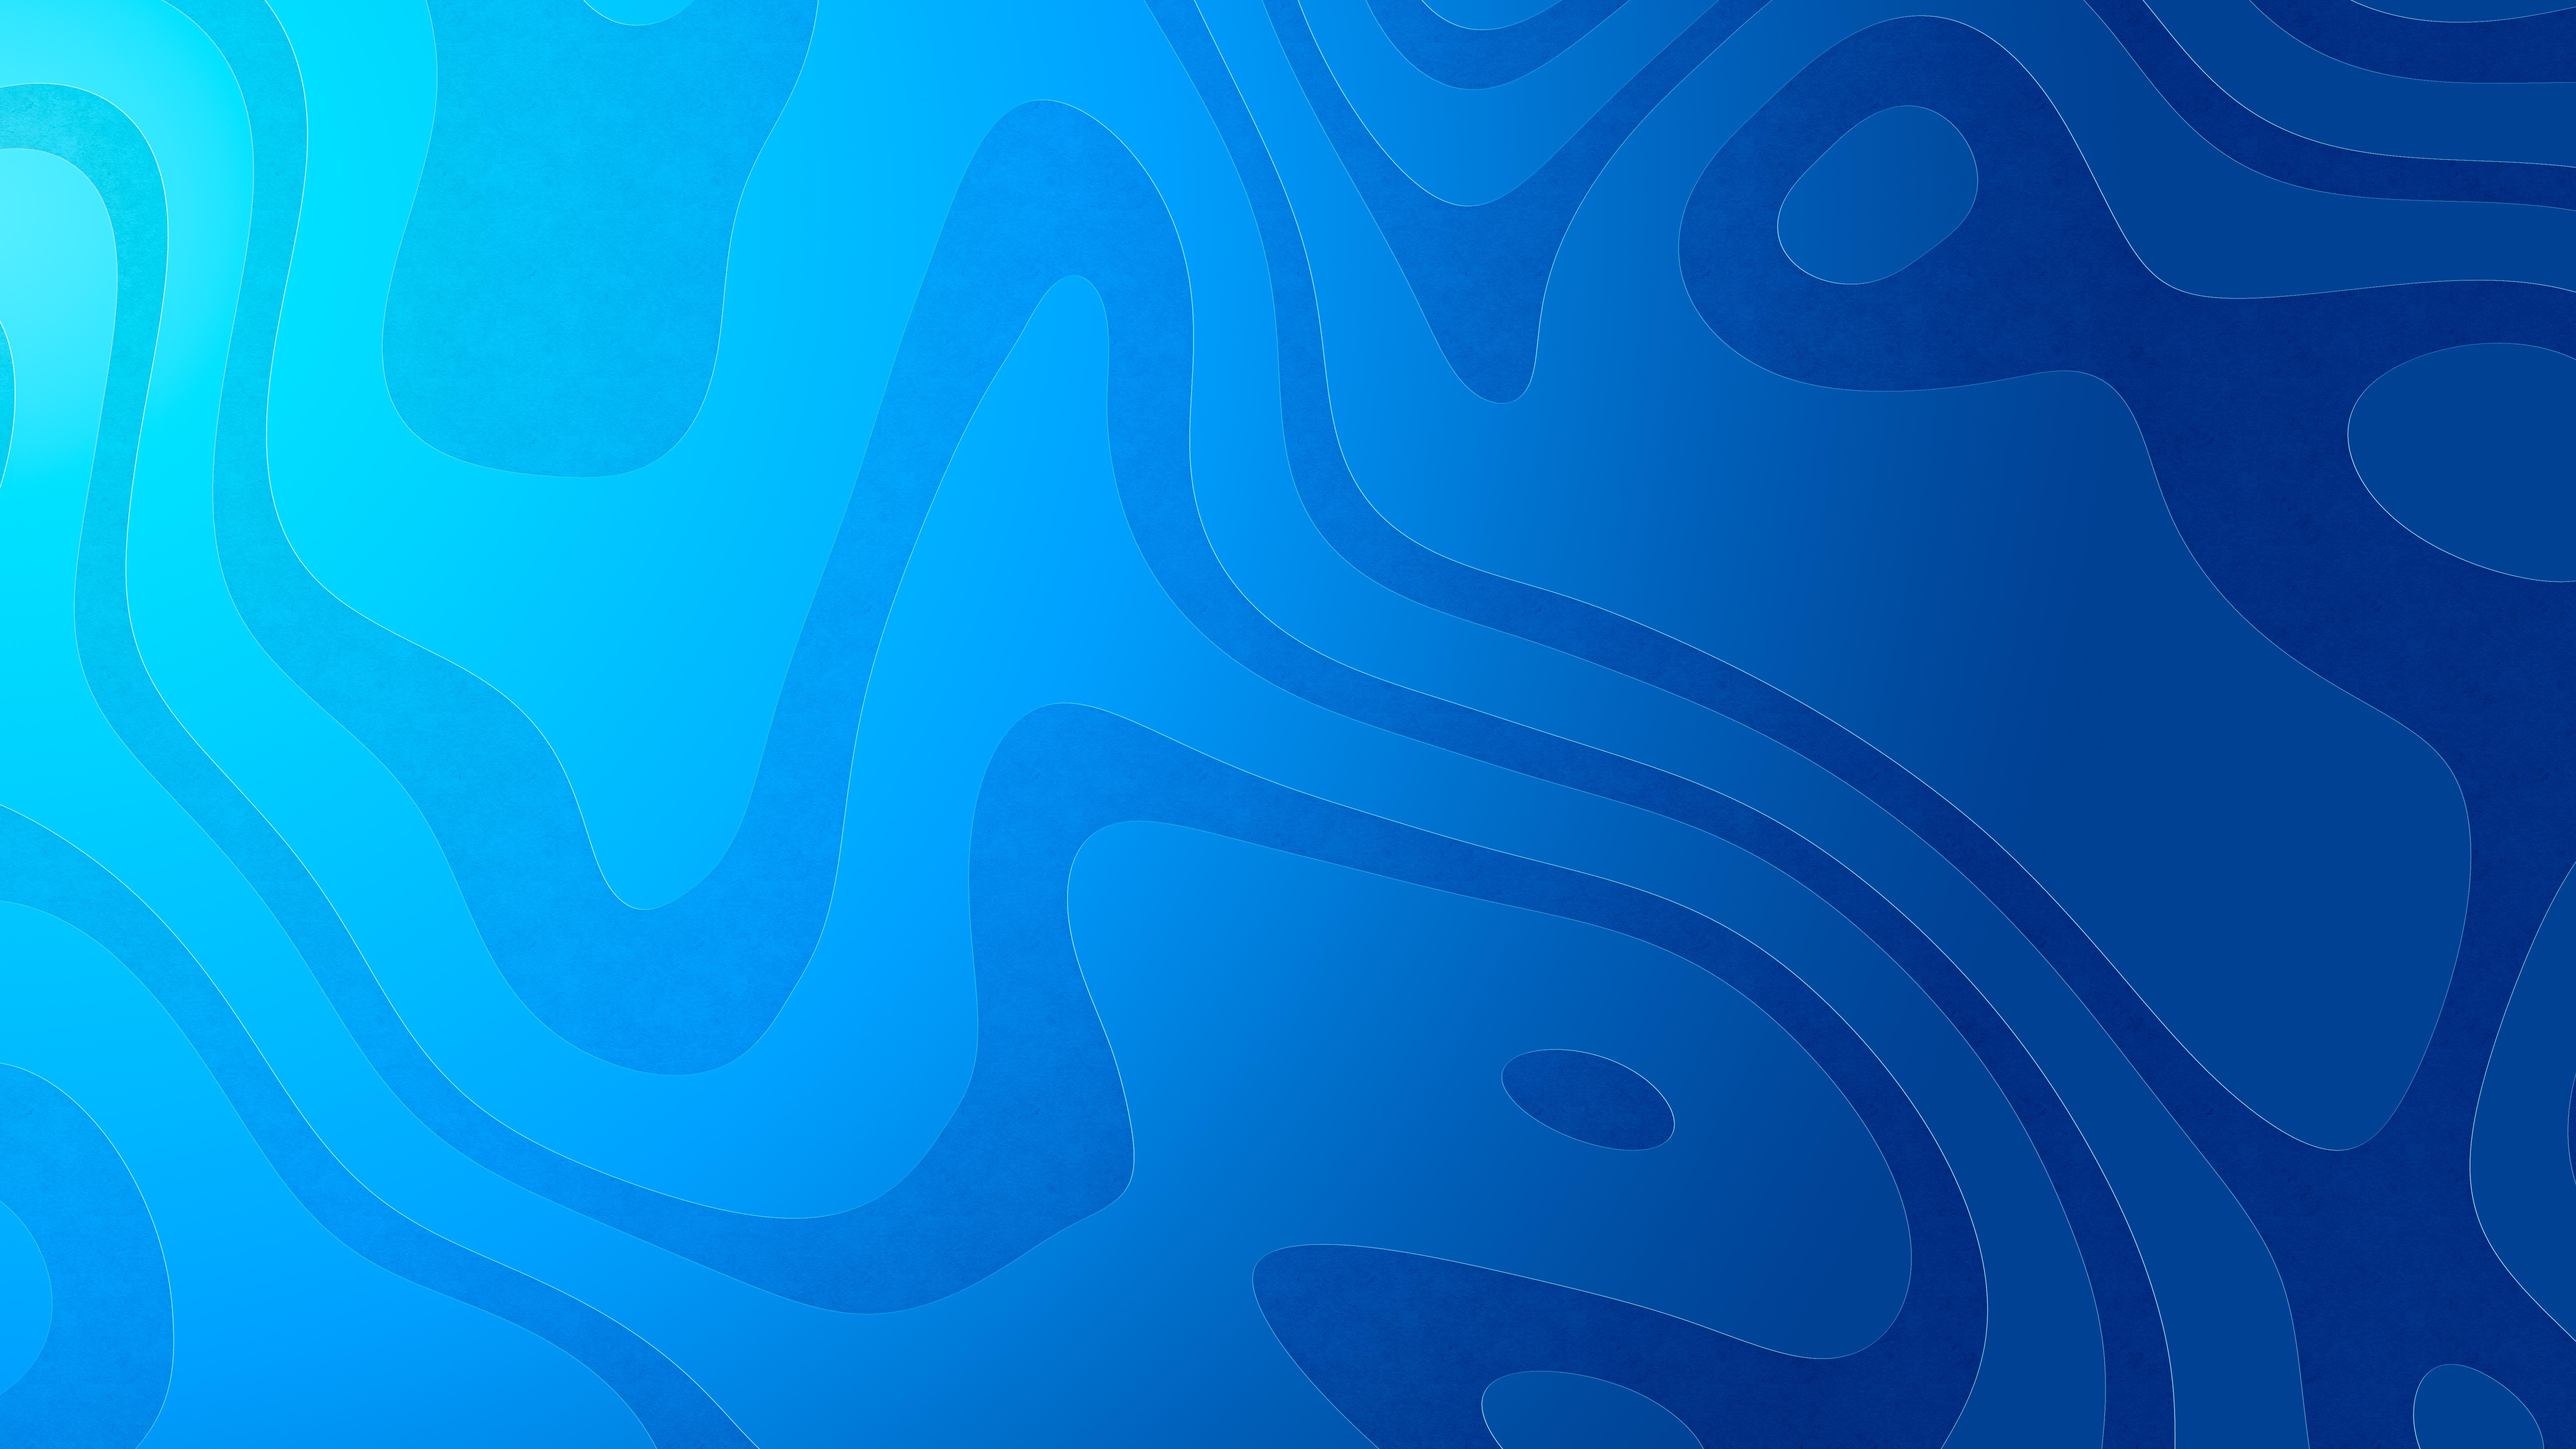 blue lines 4k 1620164317 - Blue Lines 4k - Blue Lines 4k wallpapers